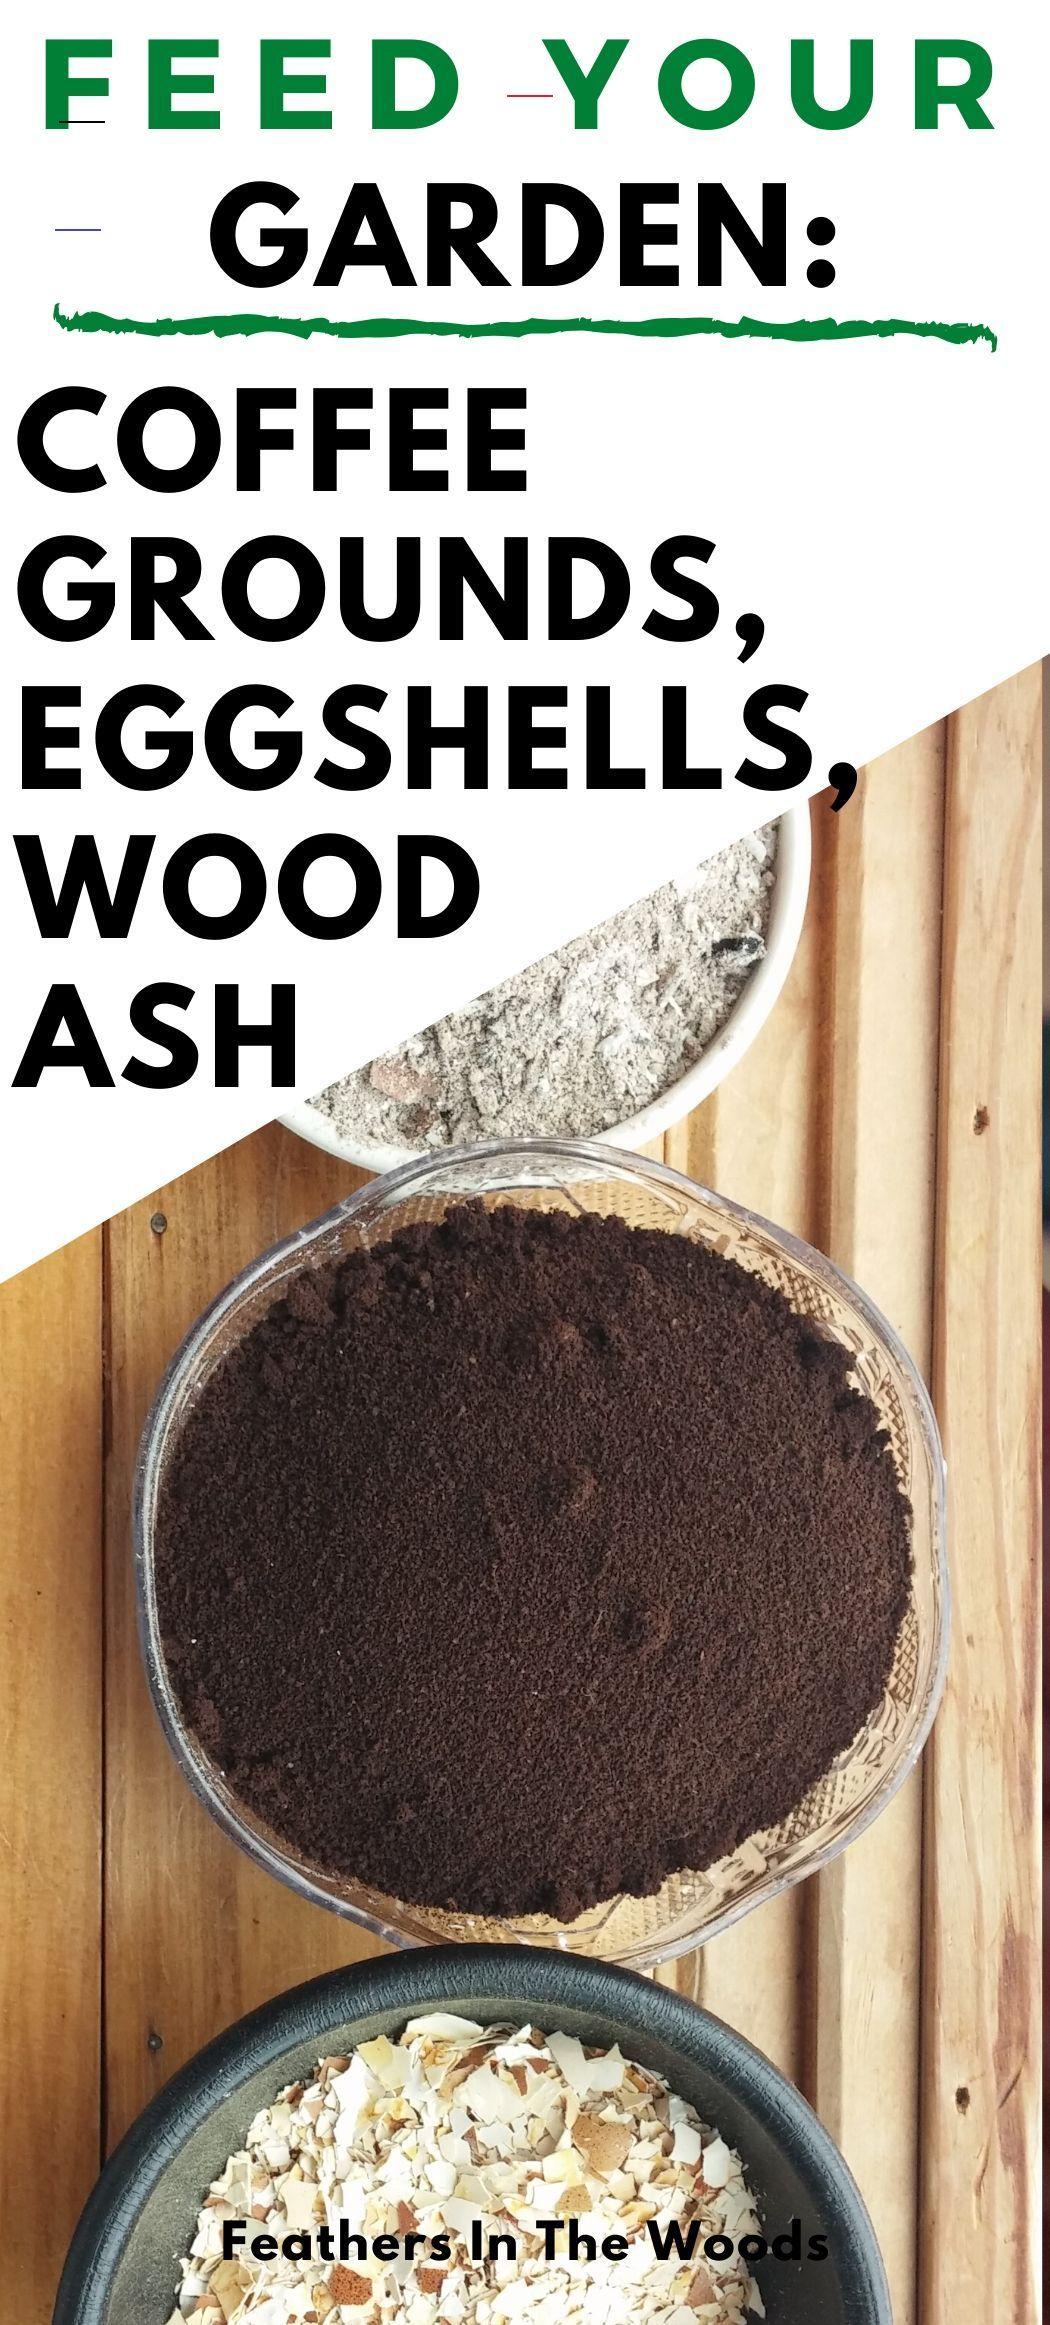 Coffee Grounds Eggshells Wood Ash Howtogrowplants How To Add Organic Soil Amendments Like Coffee Grounds Wood Ash And Eg Hacks Permacultuur Homesteading